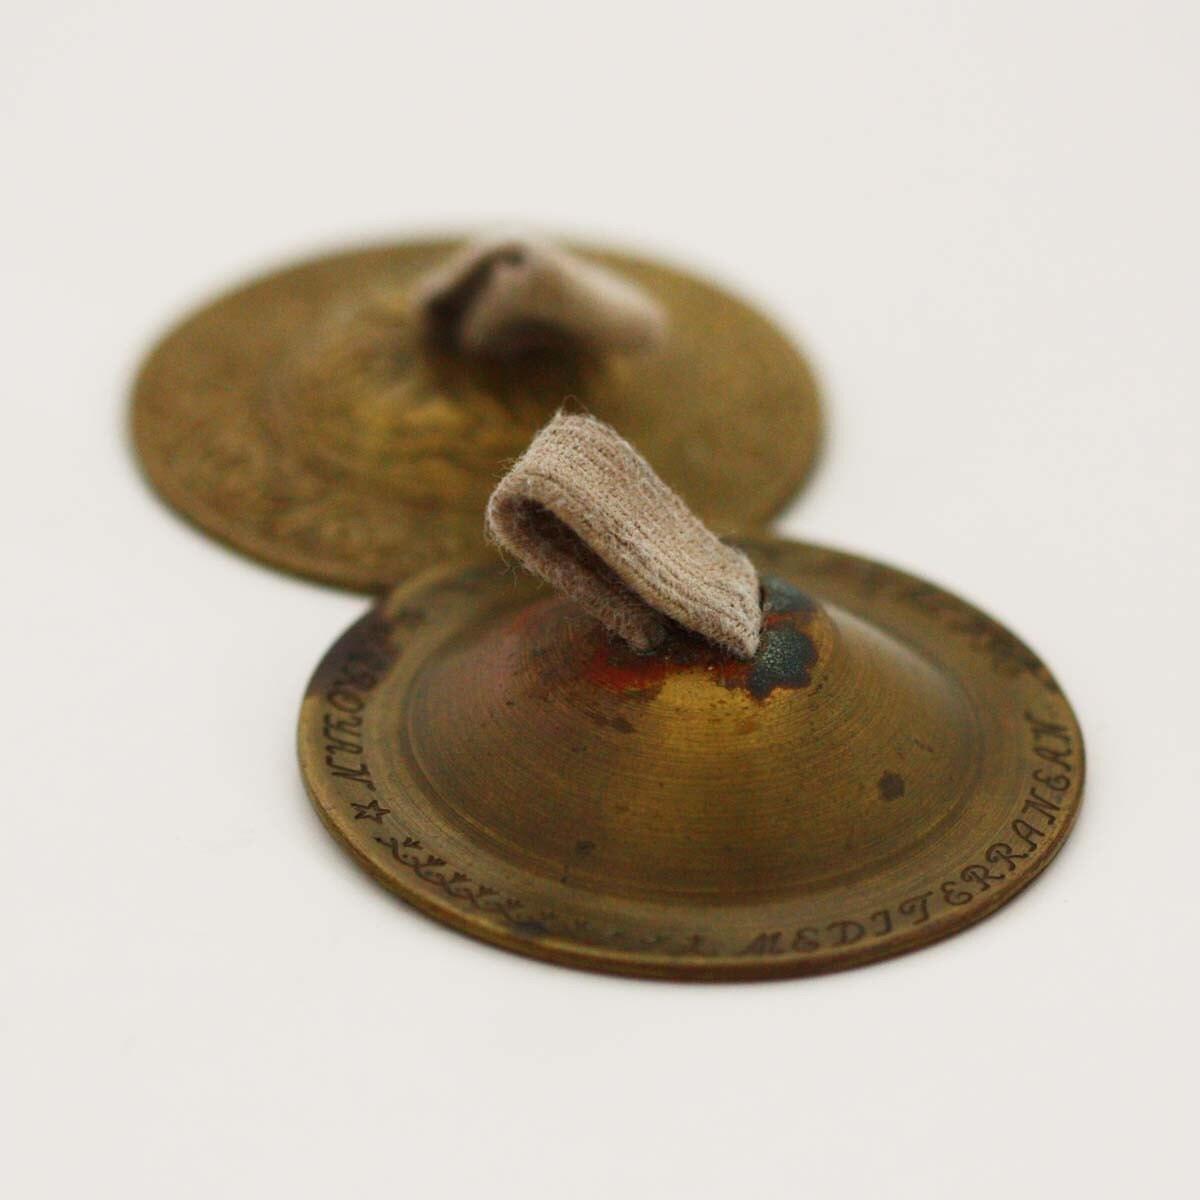 Vintage Saroyan Zills Brass Finger Cymbals by ...